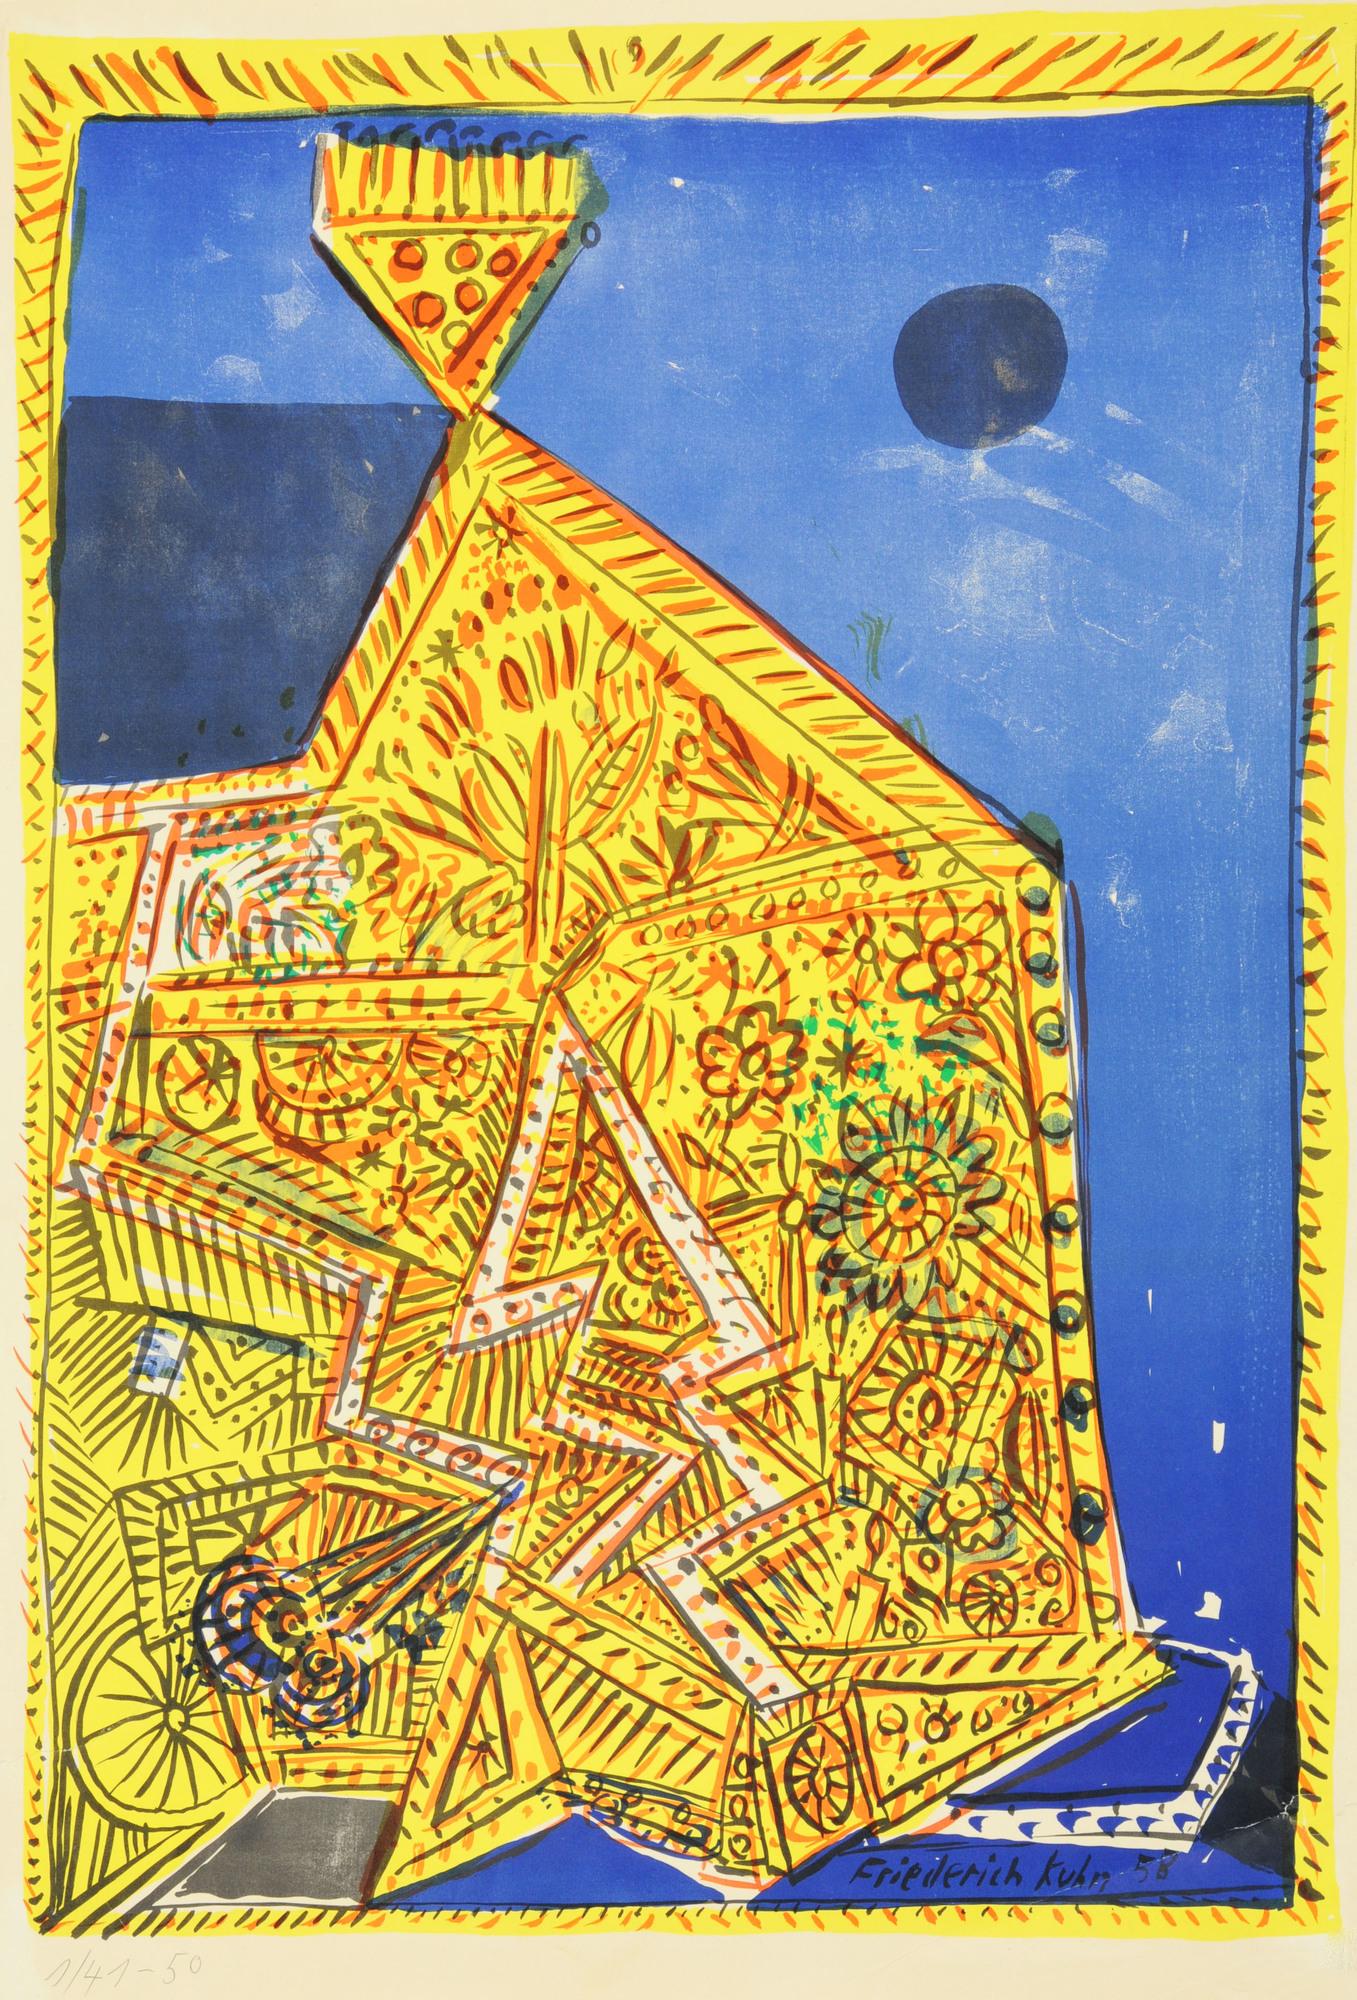 Kuhn Friedrich, 4 sheets: Untitled; Nachthaus, 1958; Untitled, 1966; Brautpaar